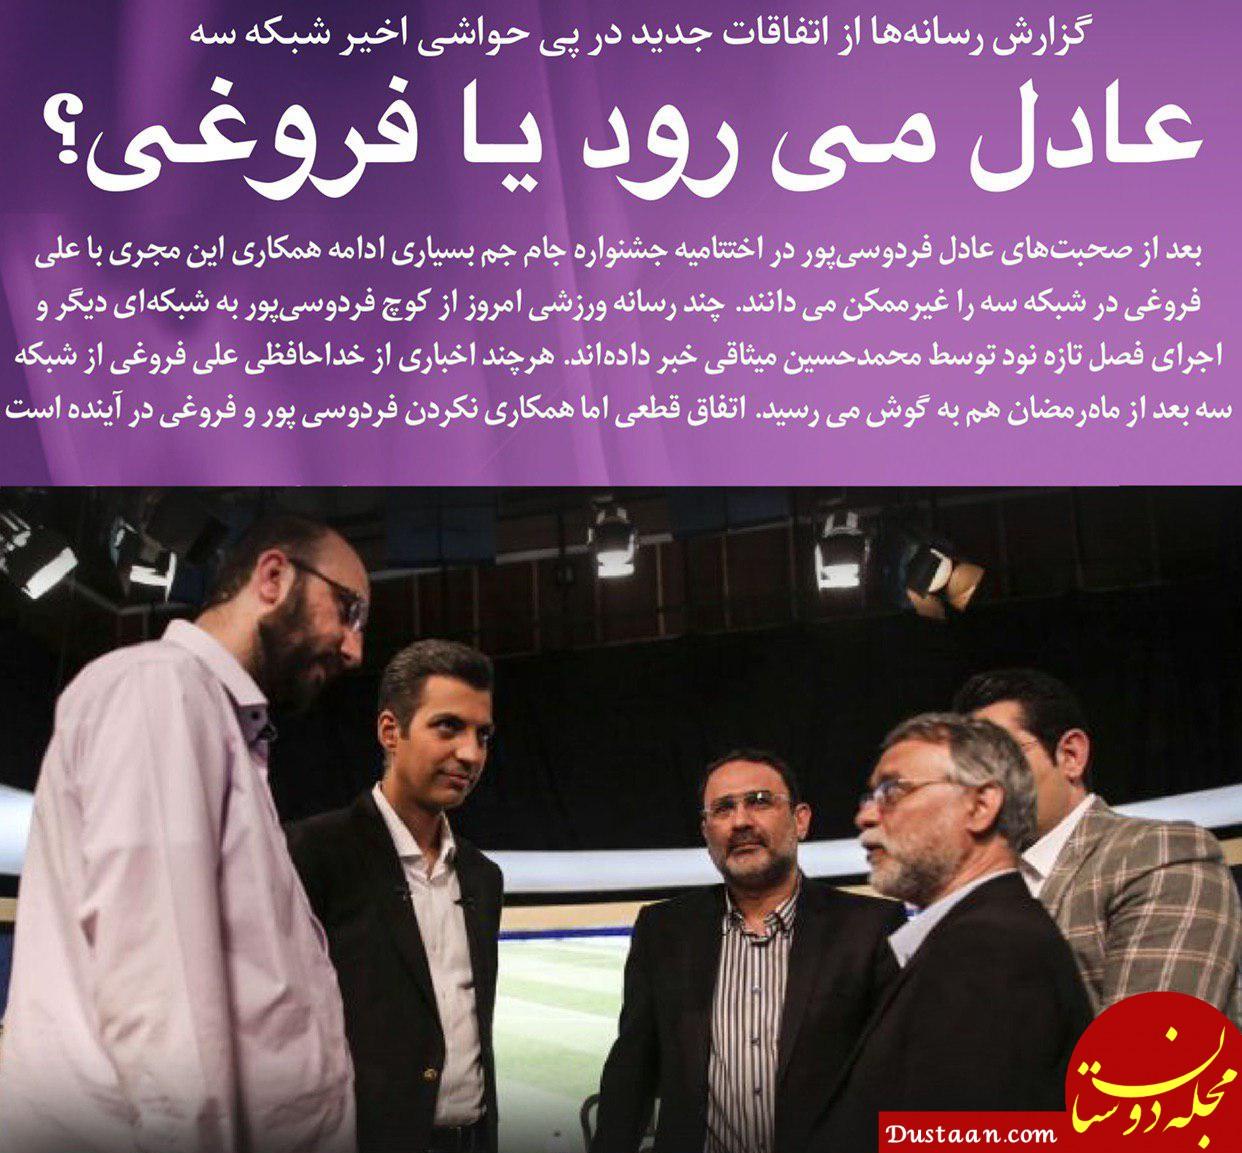 www.dustaan.com عادل فردوسی پور می رود یا علی فروغی؟!